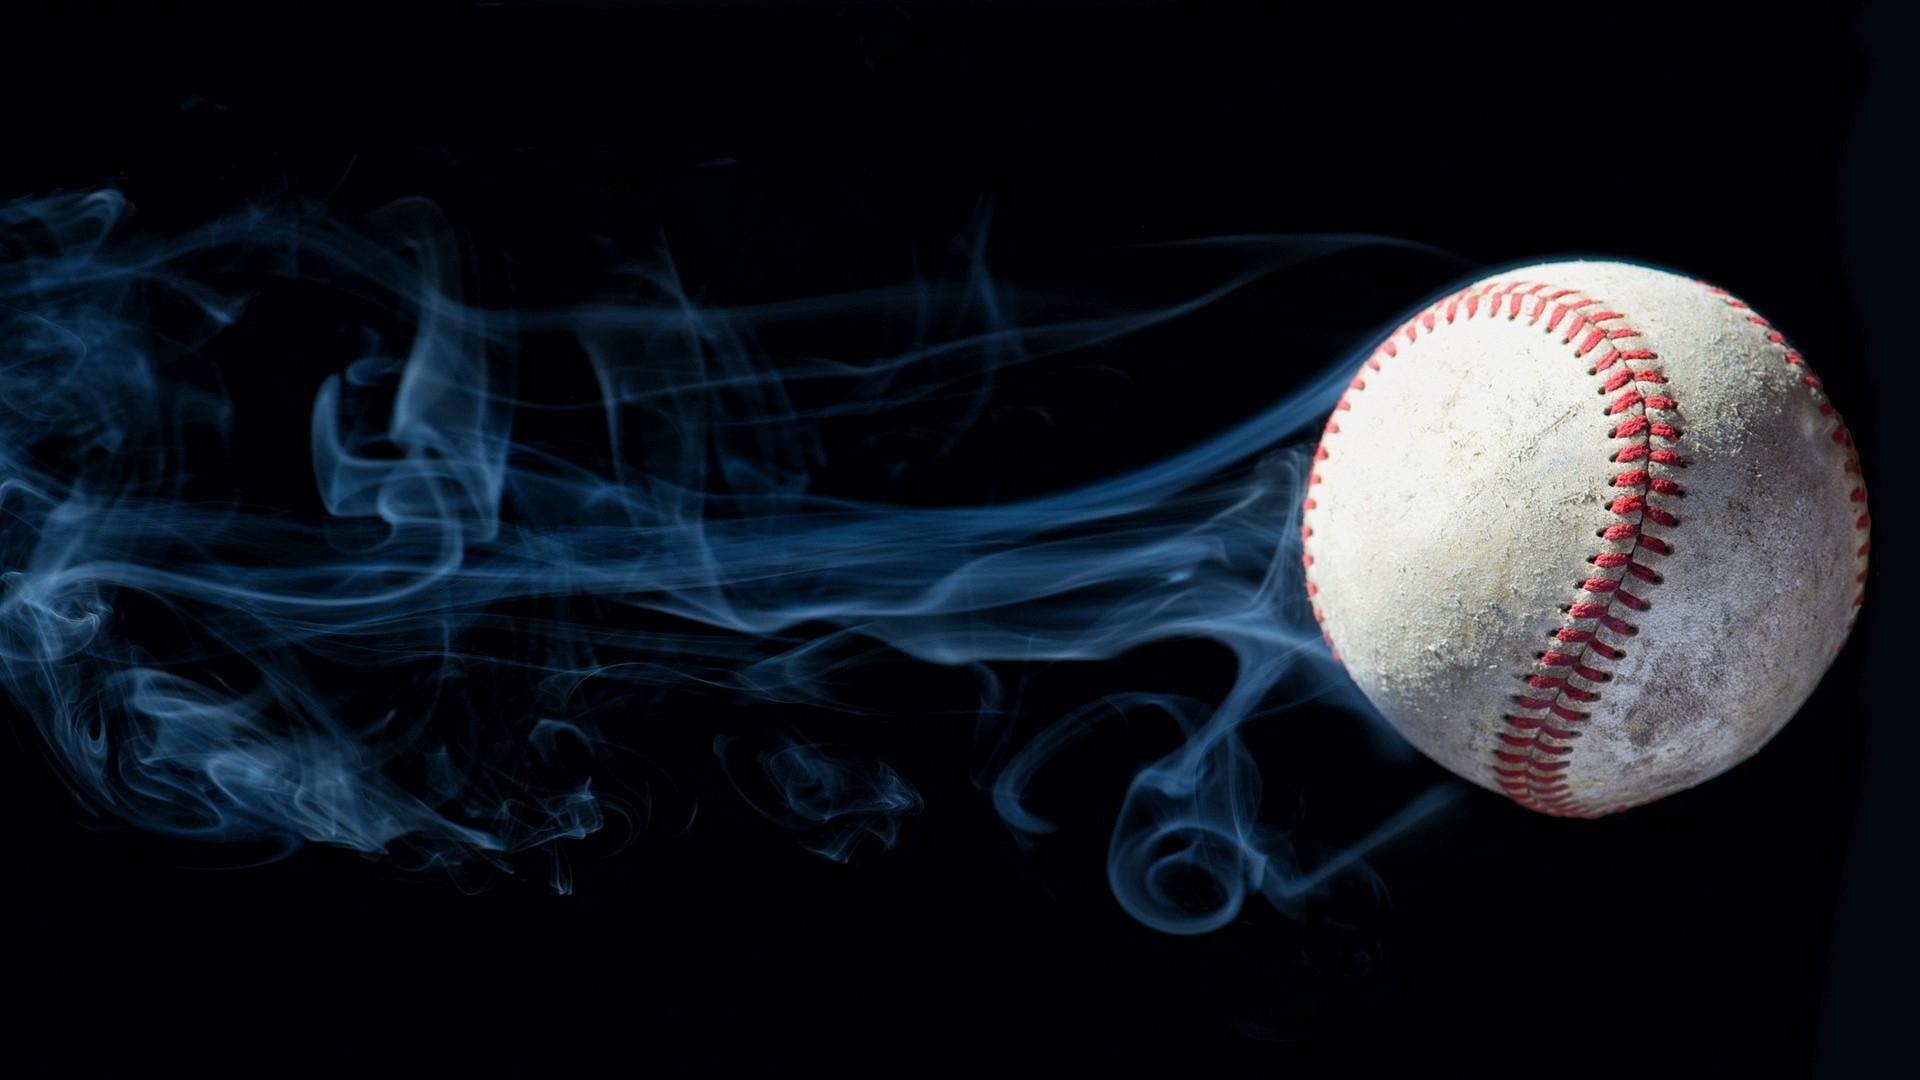 Tennis Ball Smoke 3D Wallpaper   HQ Wallpapers download 100 high 1920x1080